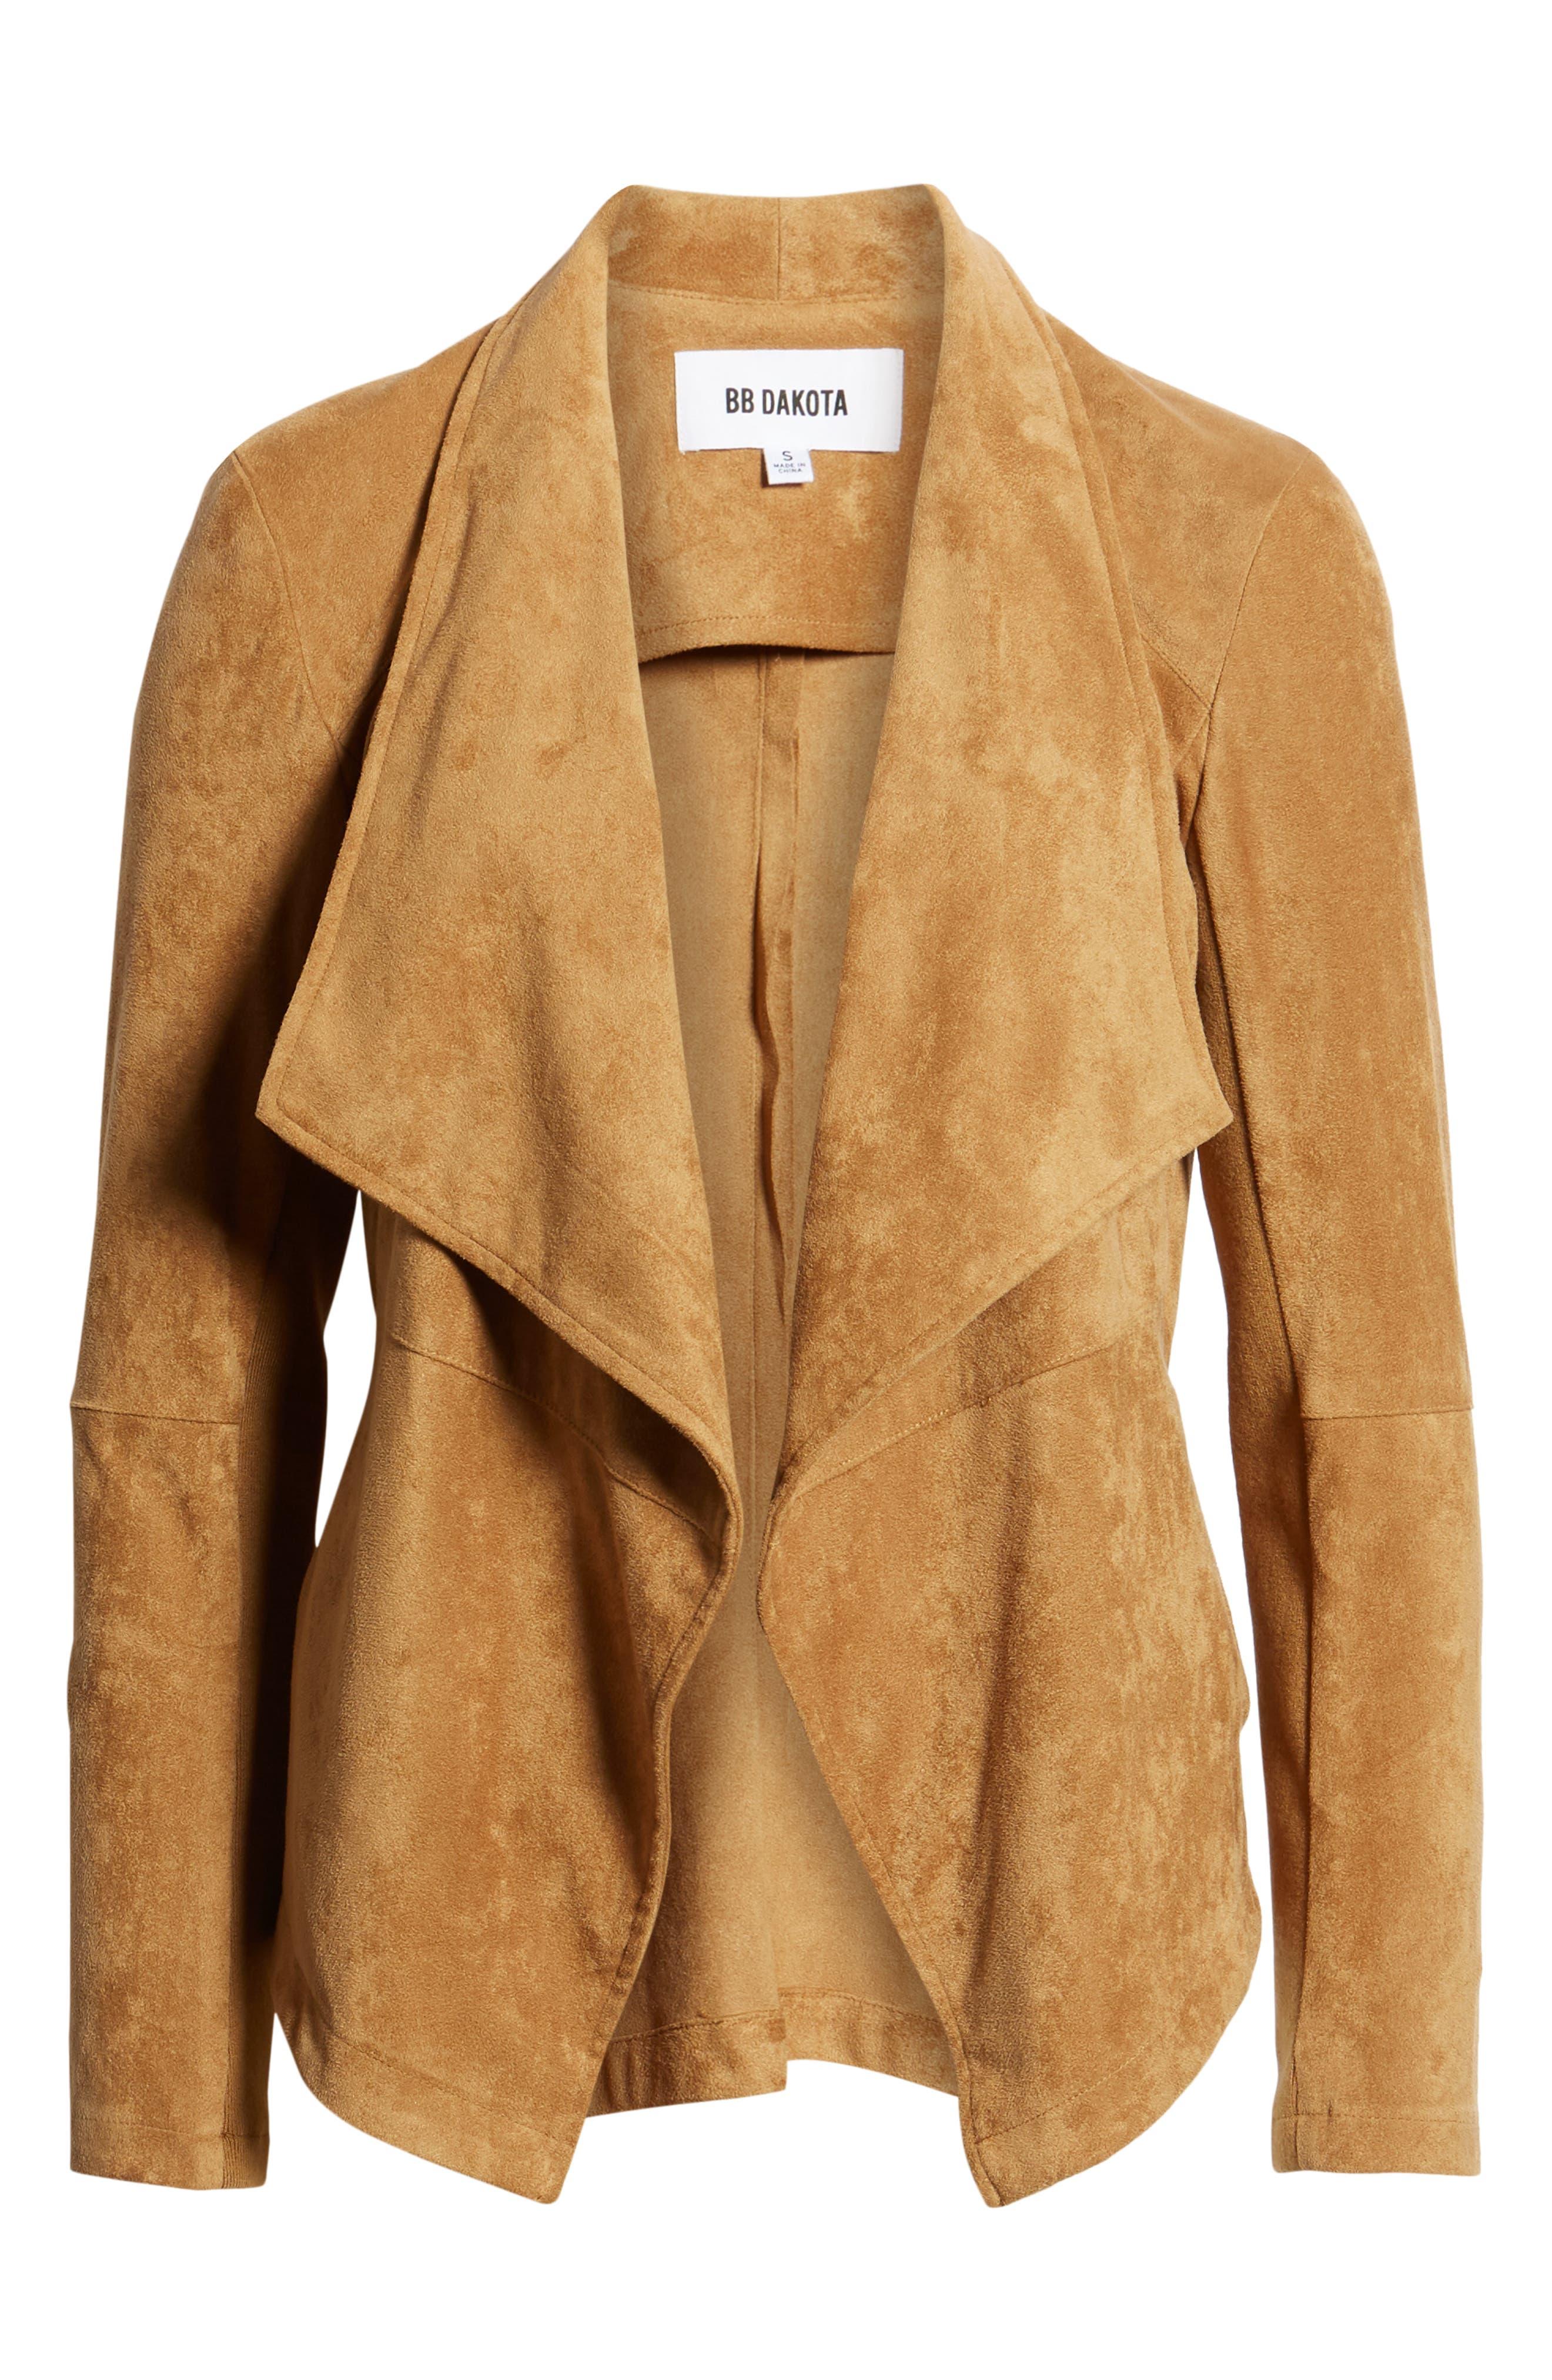 BB DAKOTA,                             Nicholson Faux Suede Drape Front Jacket,                             Alternate thumbnail 6, color,                             WHISKEY